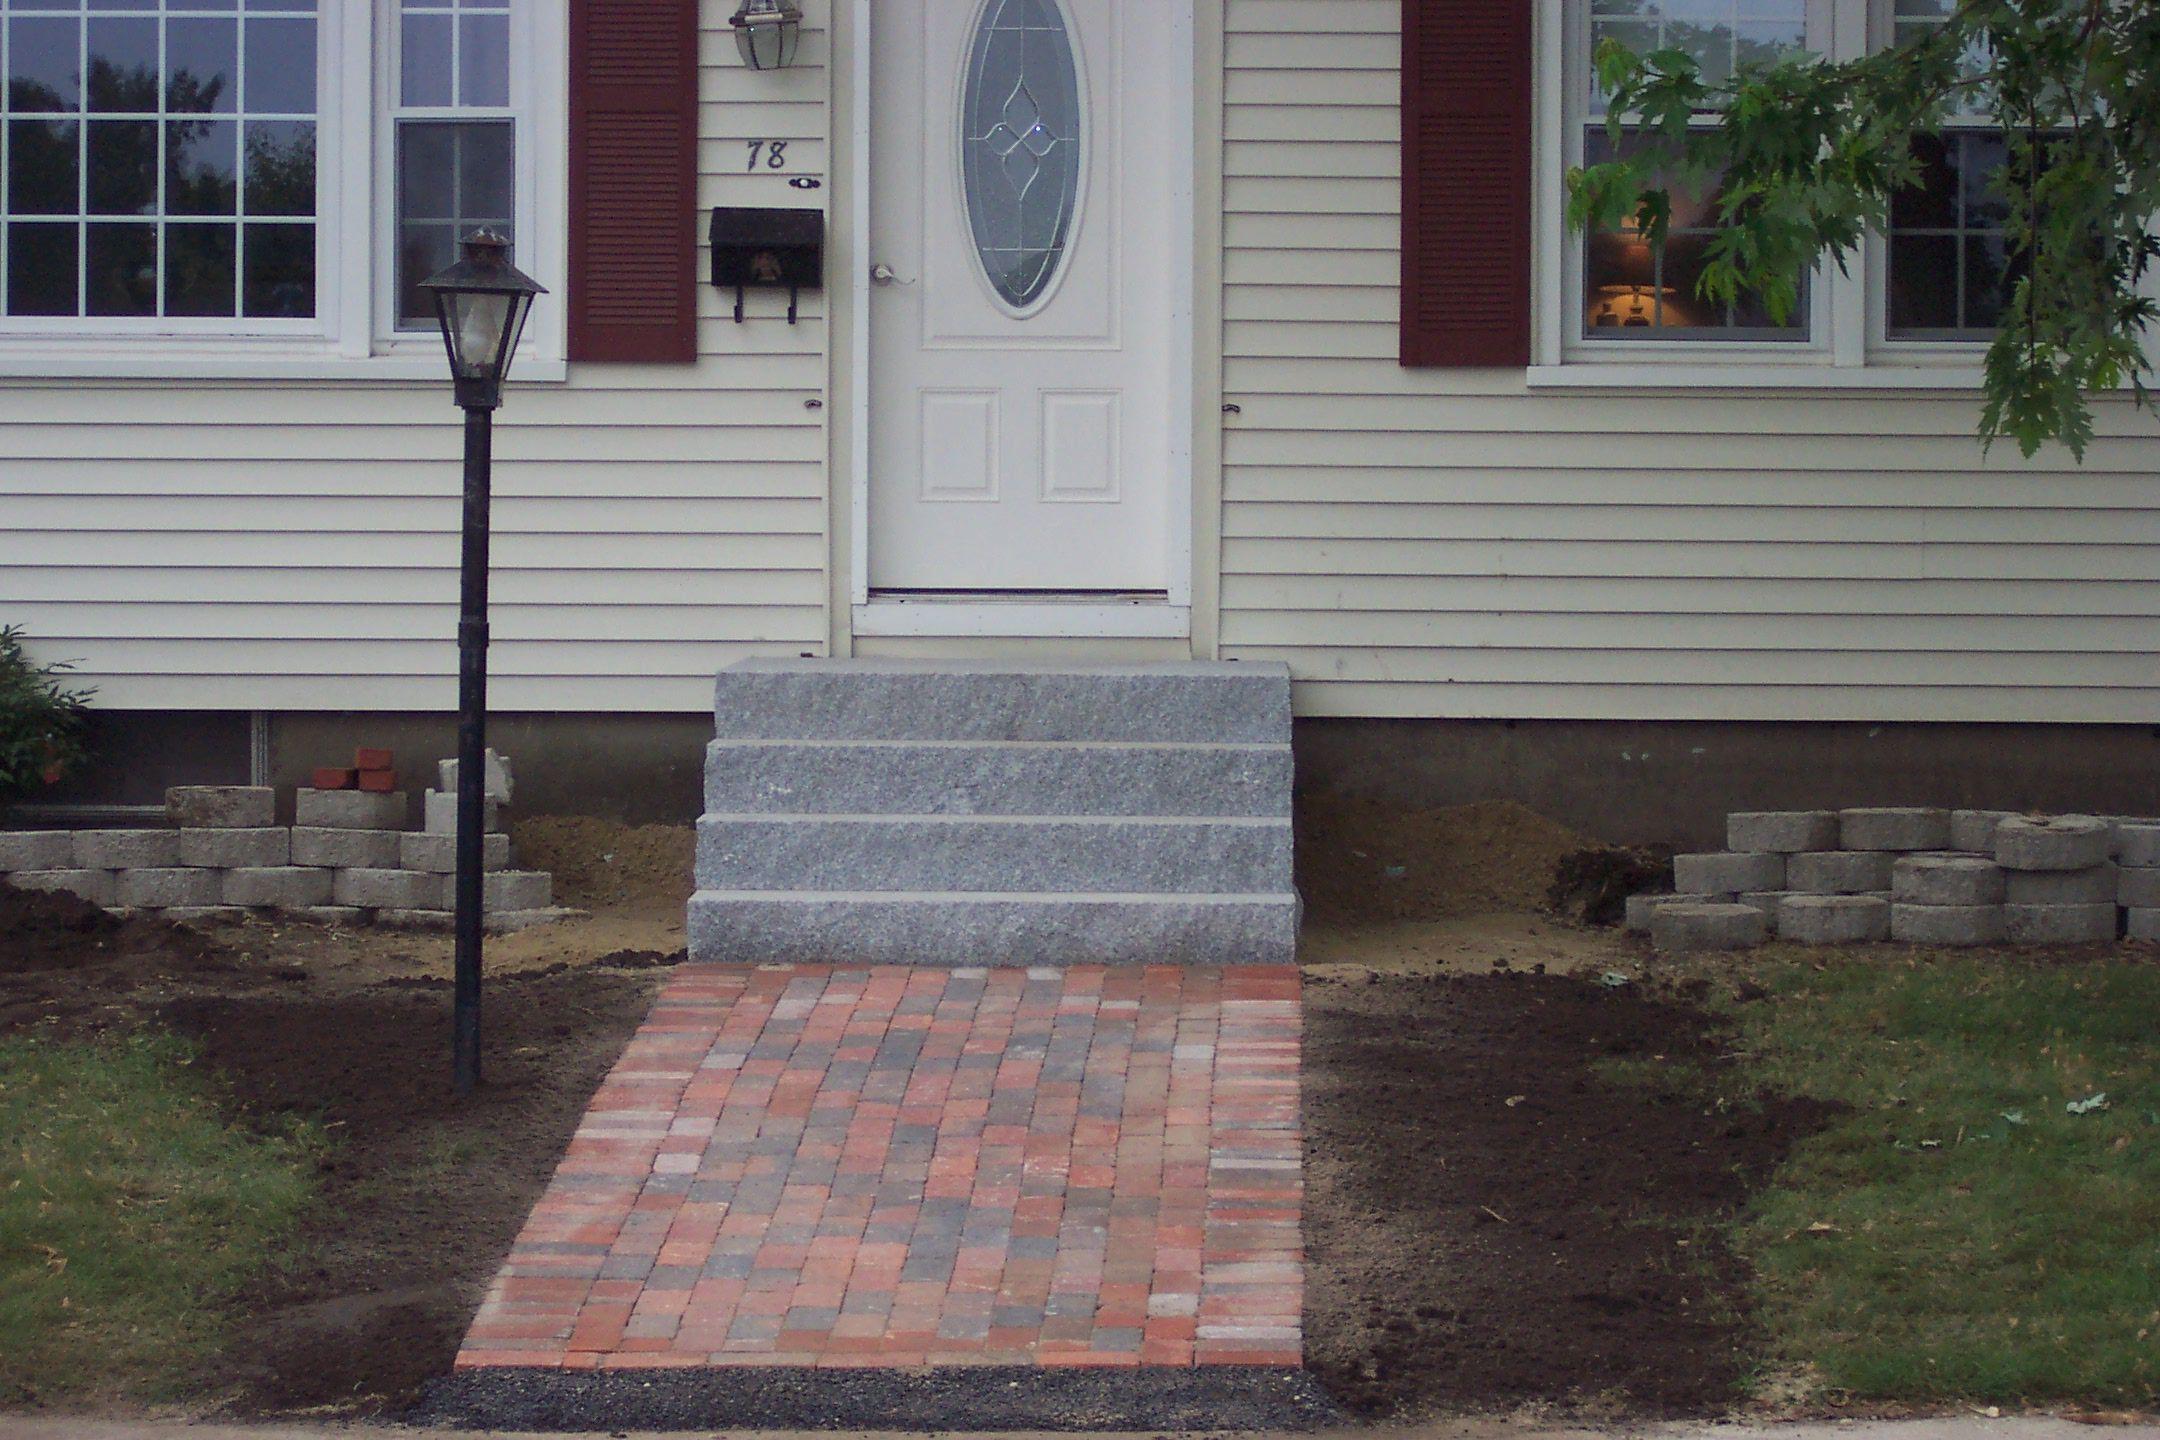 A Brick Walkway Leading To Granite Steps Makes For A Clean Look Brick Walkway Walkway Outdoor Decor